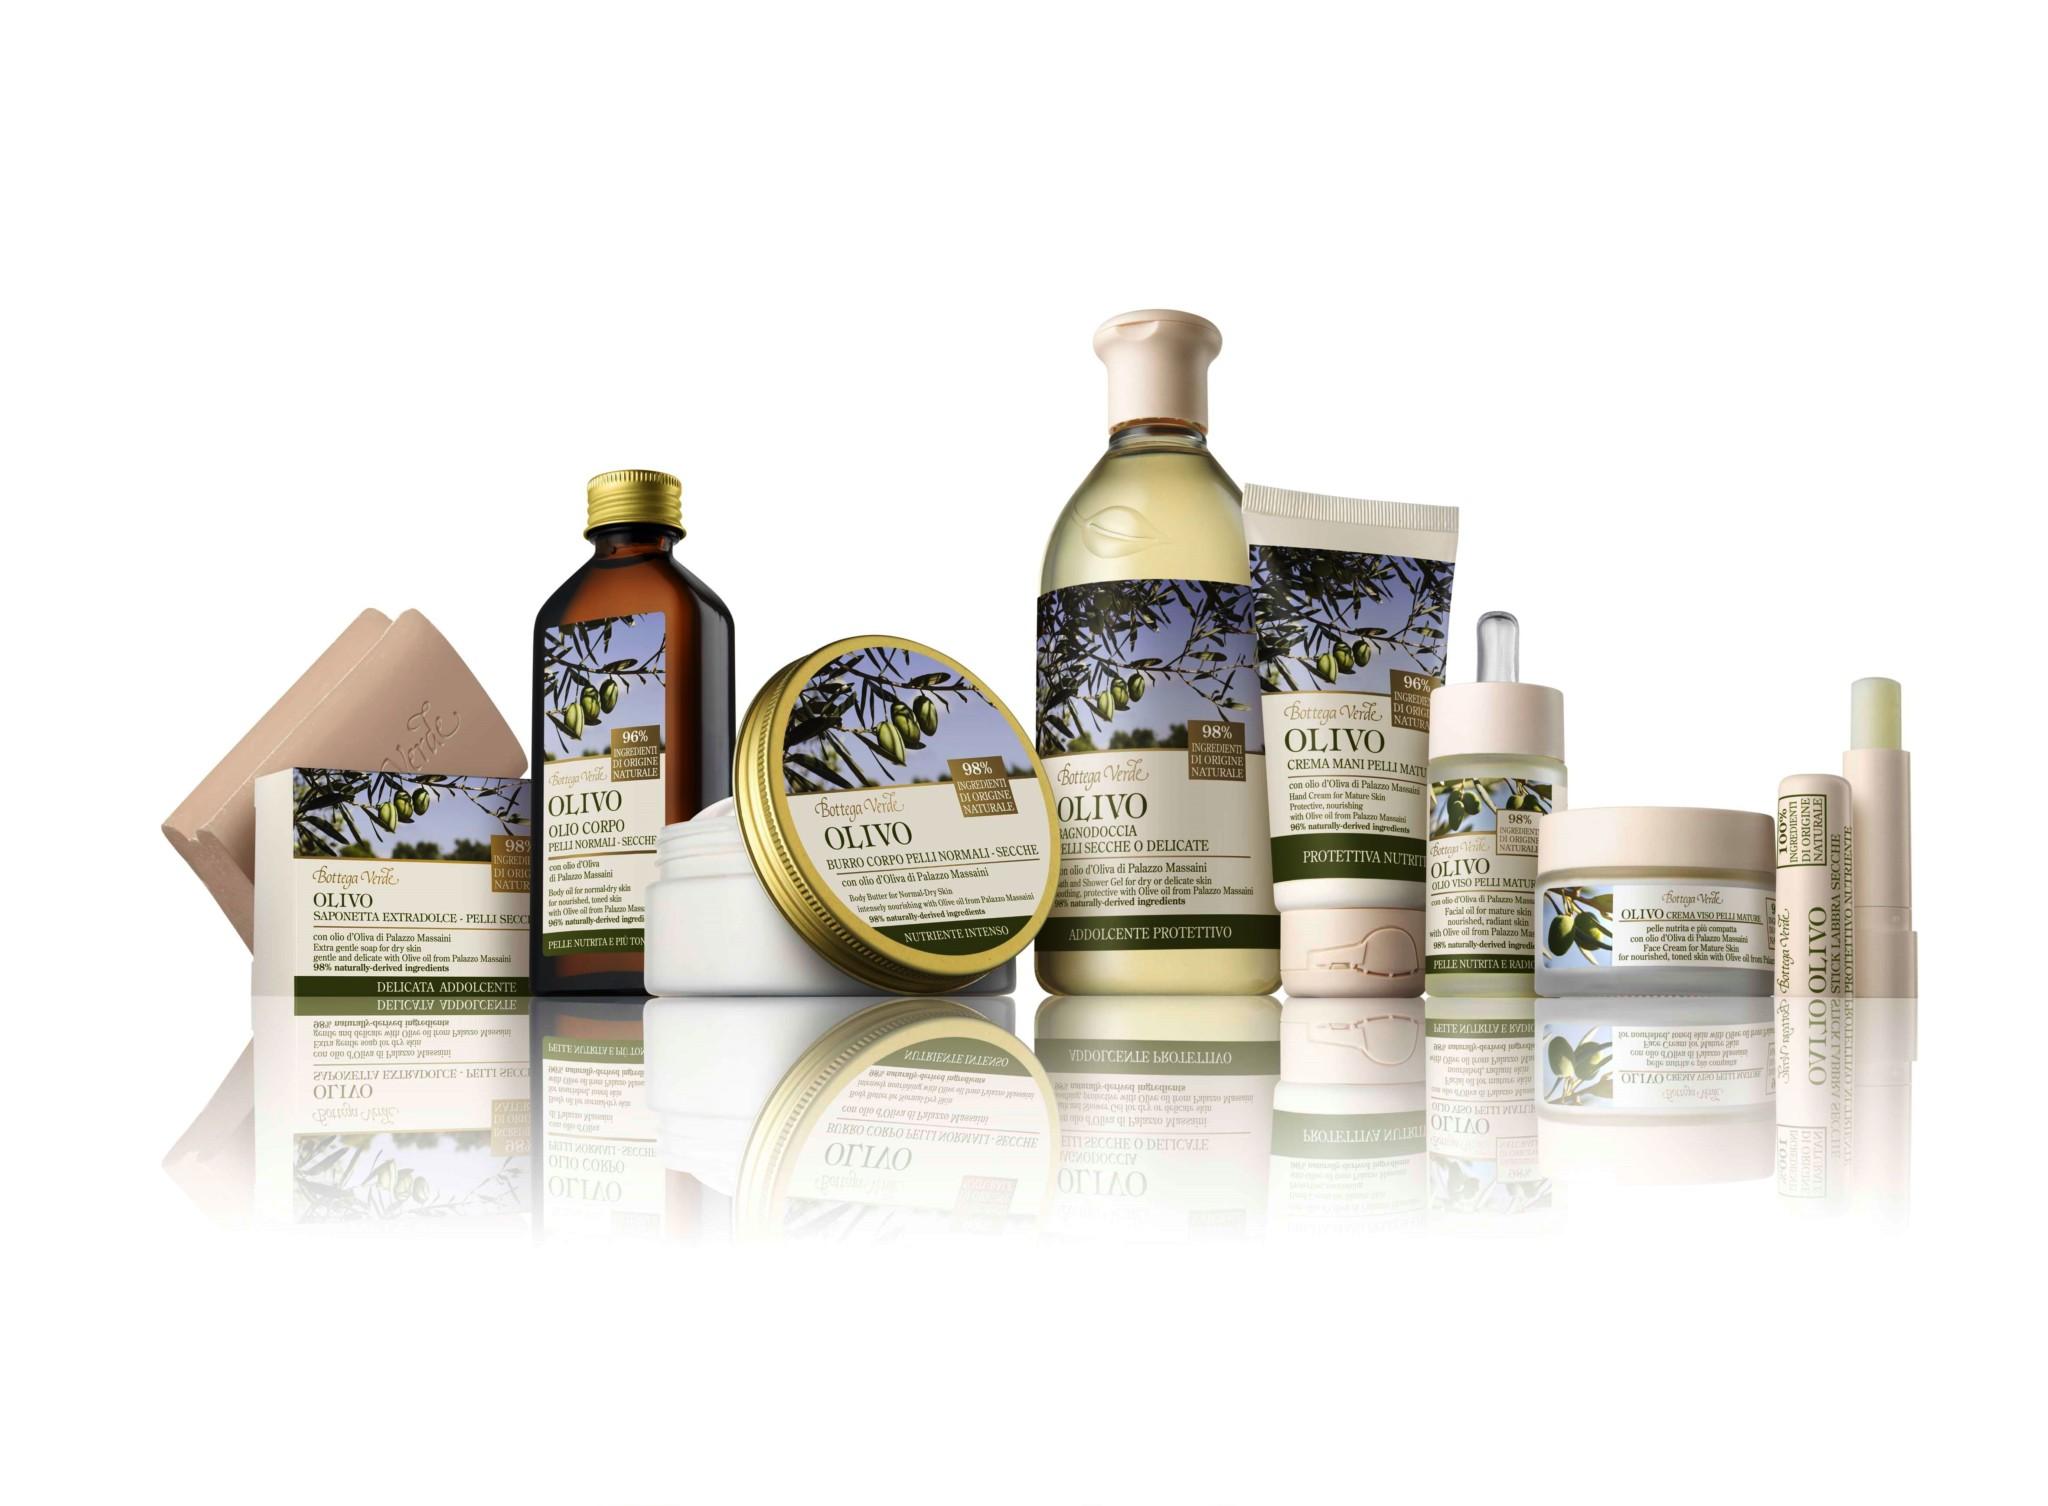 Bagno Doccia Bottega Verde : Bottega verde nasce olivo con olio d oliva di palazzo massaini